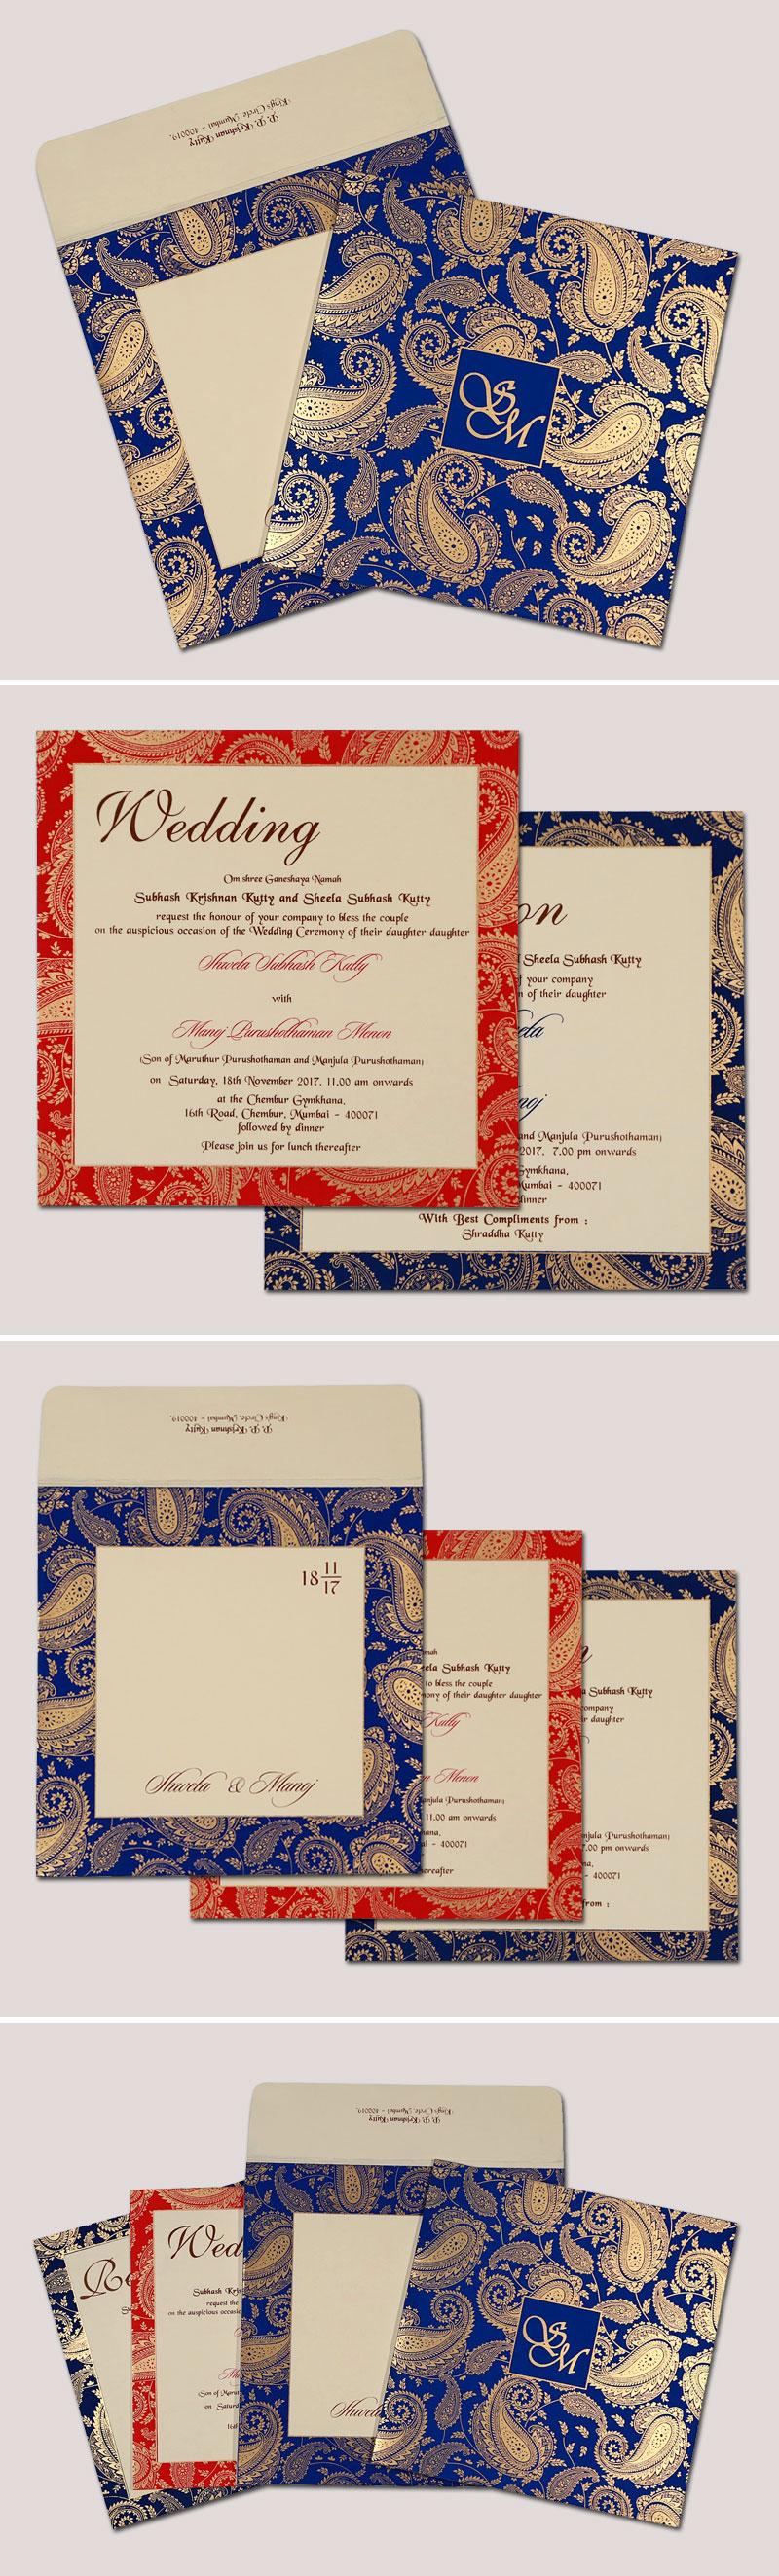 invitation card wordings for indian wedding%0A An invite by Uttara Shah   Wedding Invitation Ideas   Pinterest   Invitation  ideas  Wedding and Unique weddings